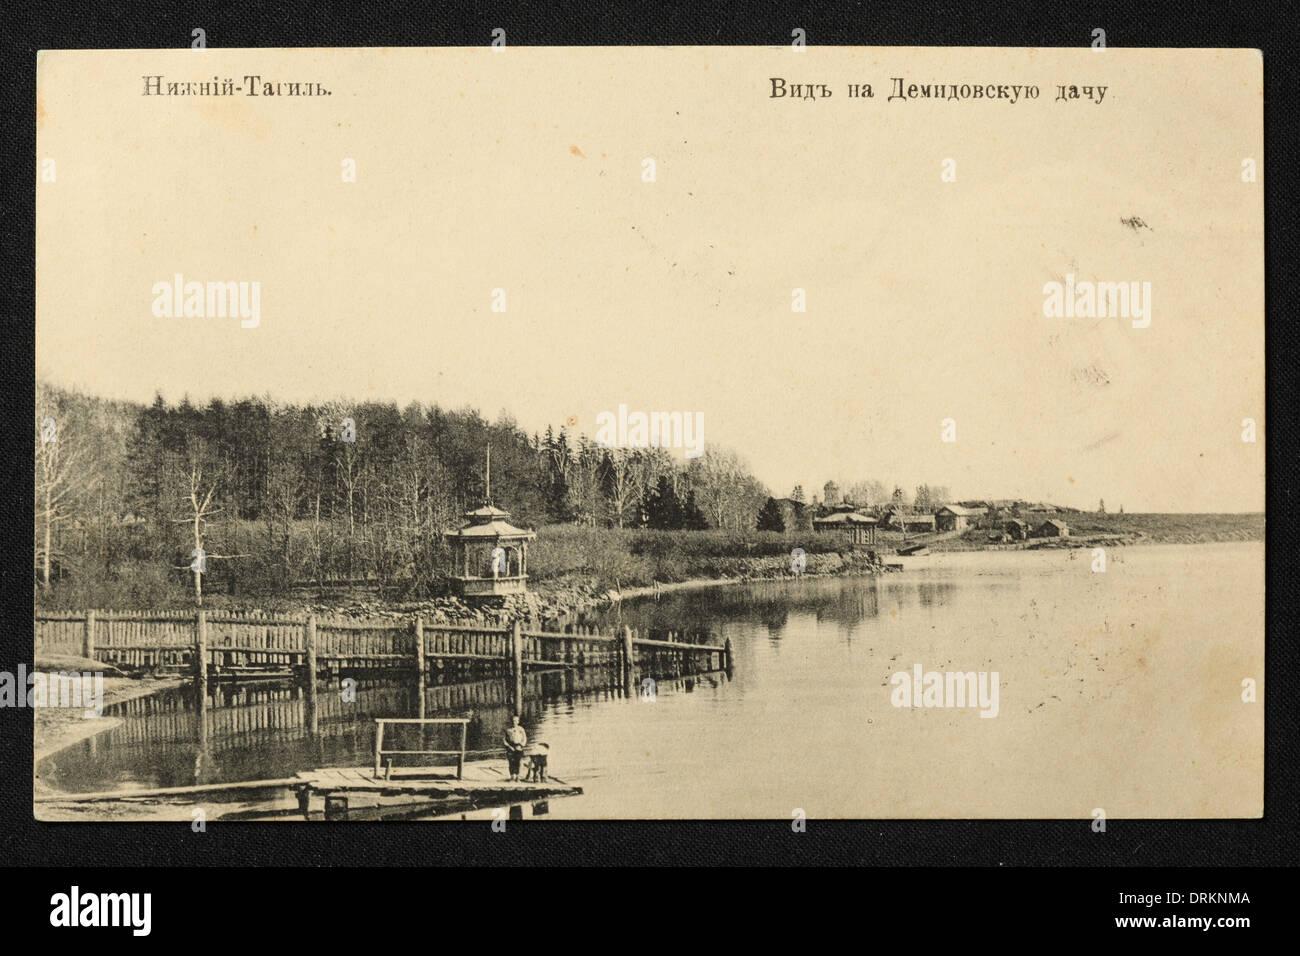 Uralgebirge Karte.Tagil Stockfotos Tagil Bilder Alamy